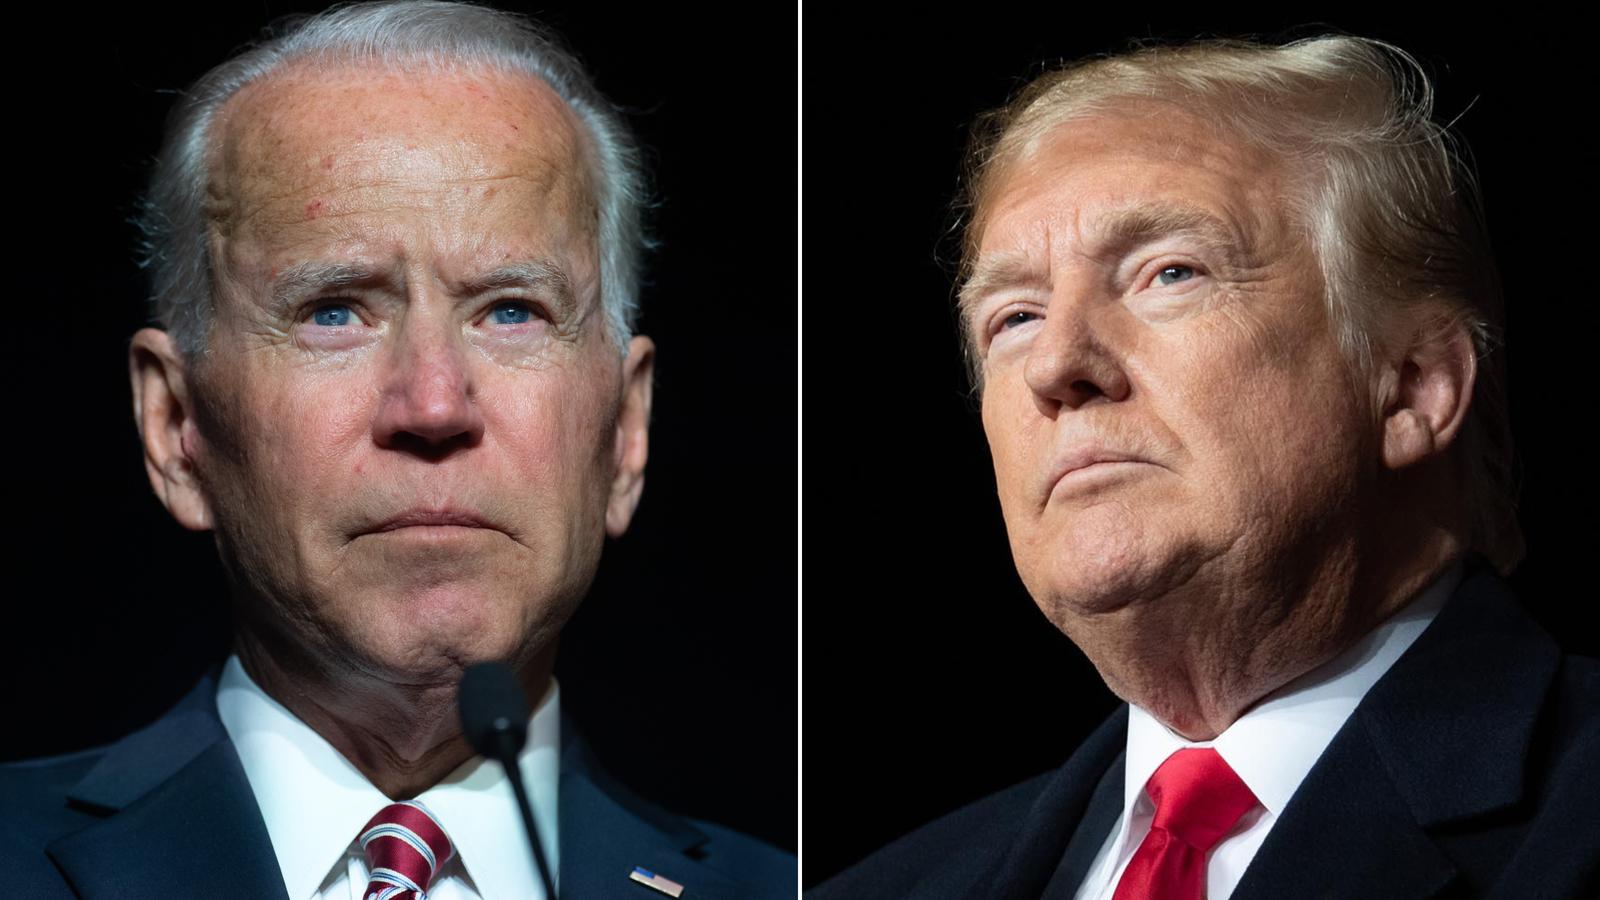 Biden lies less than Trump, fact-checkers say. But he's not perfect